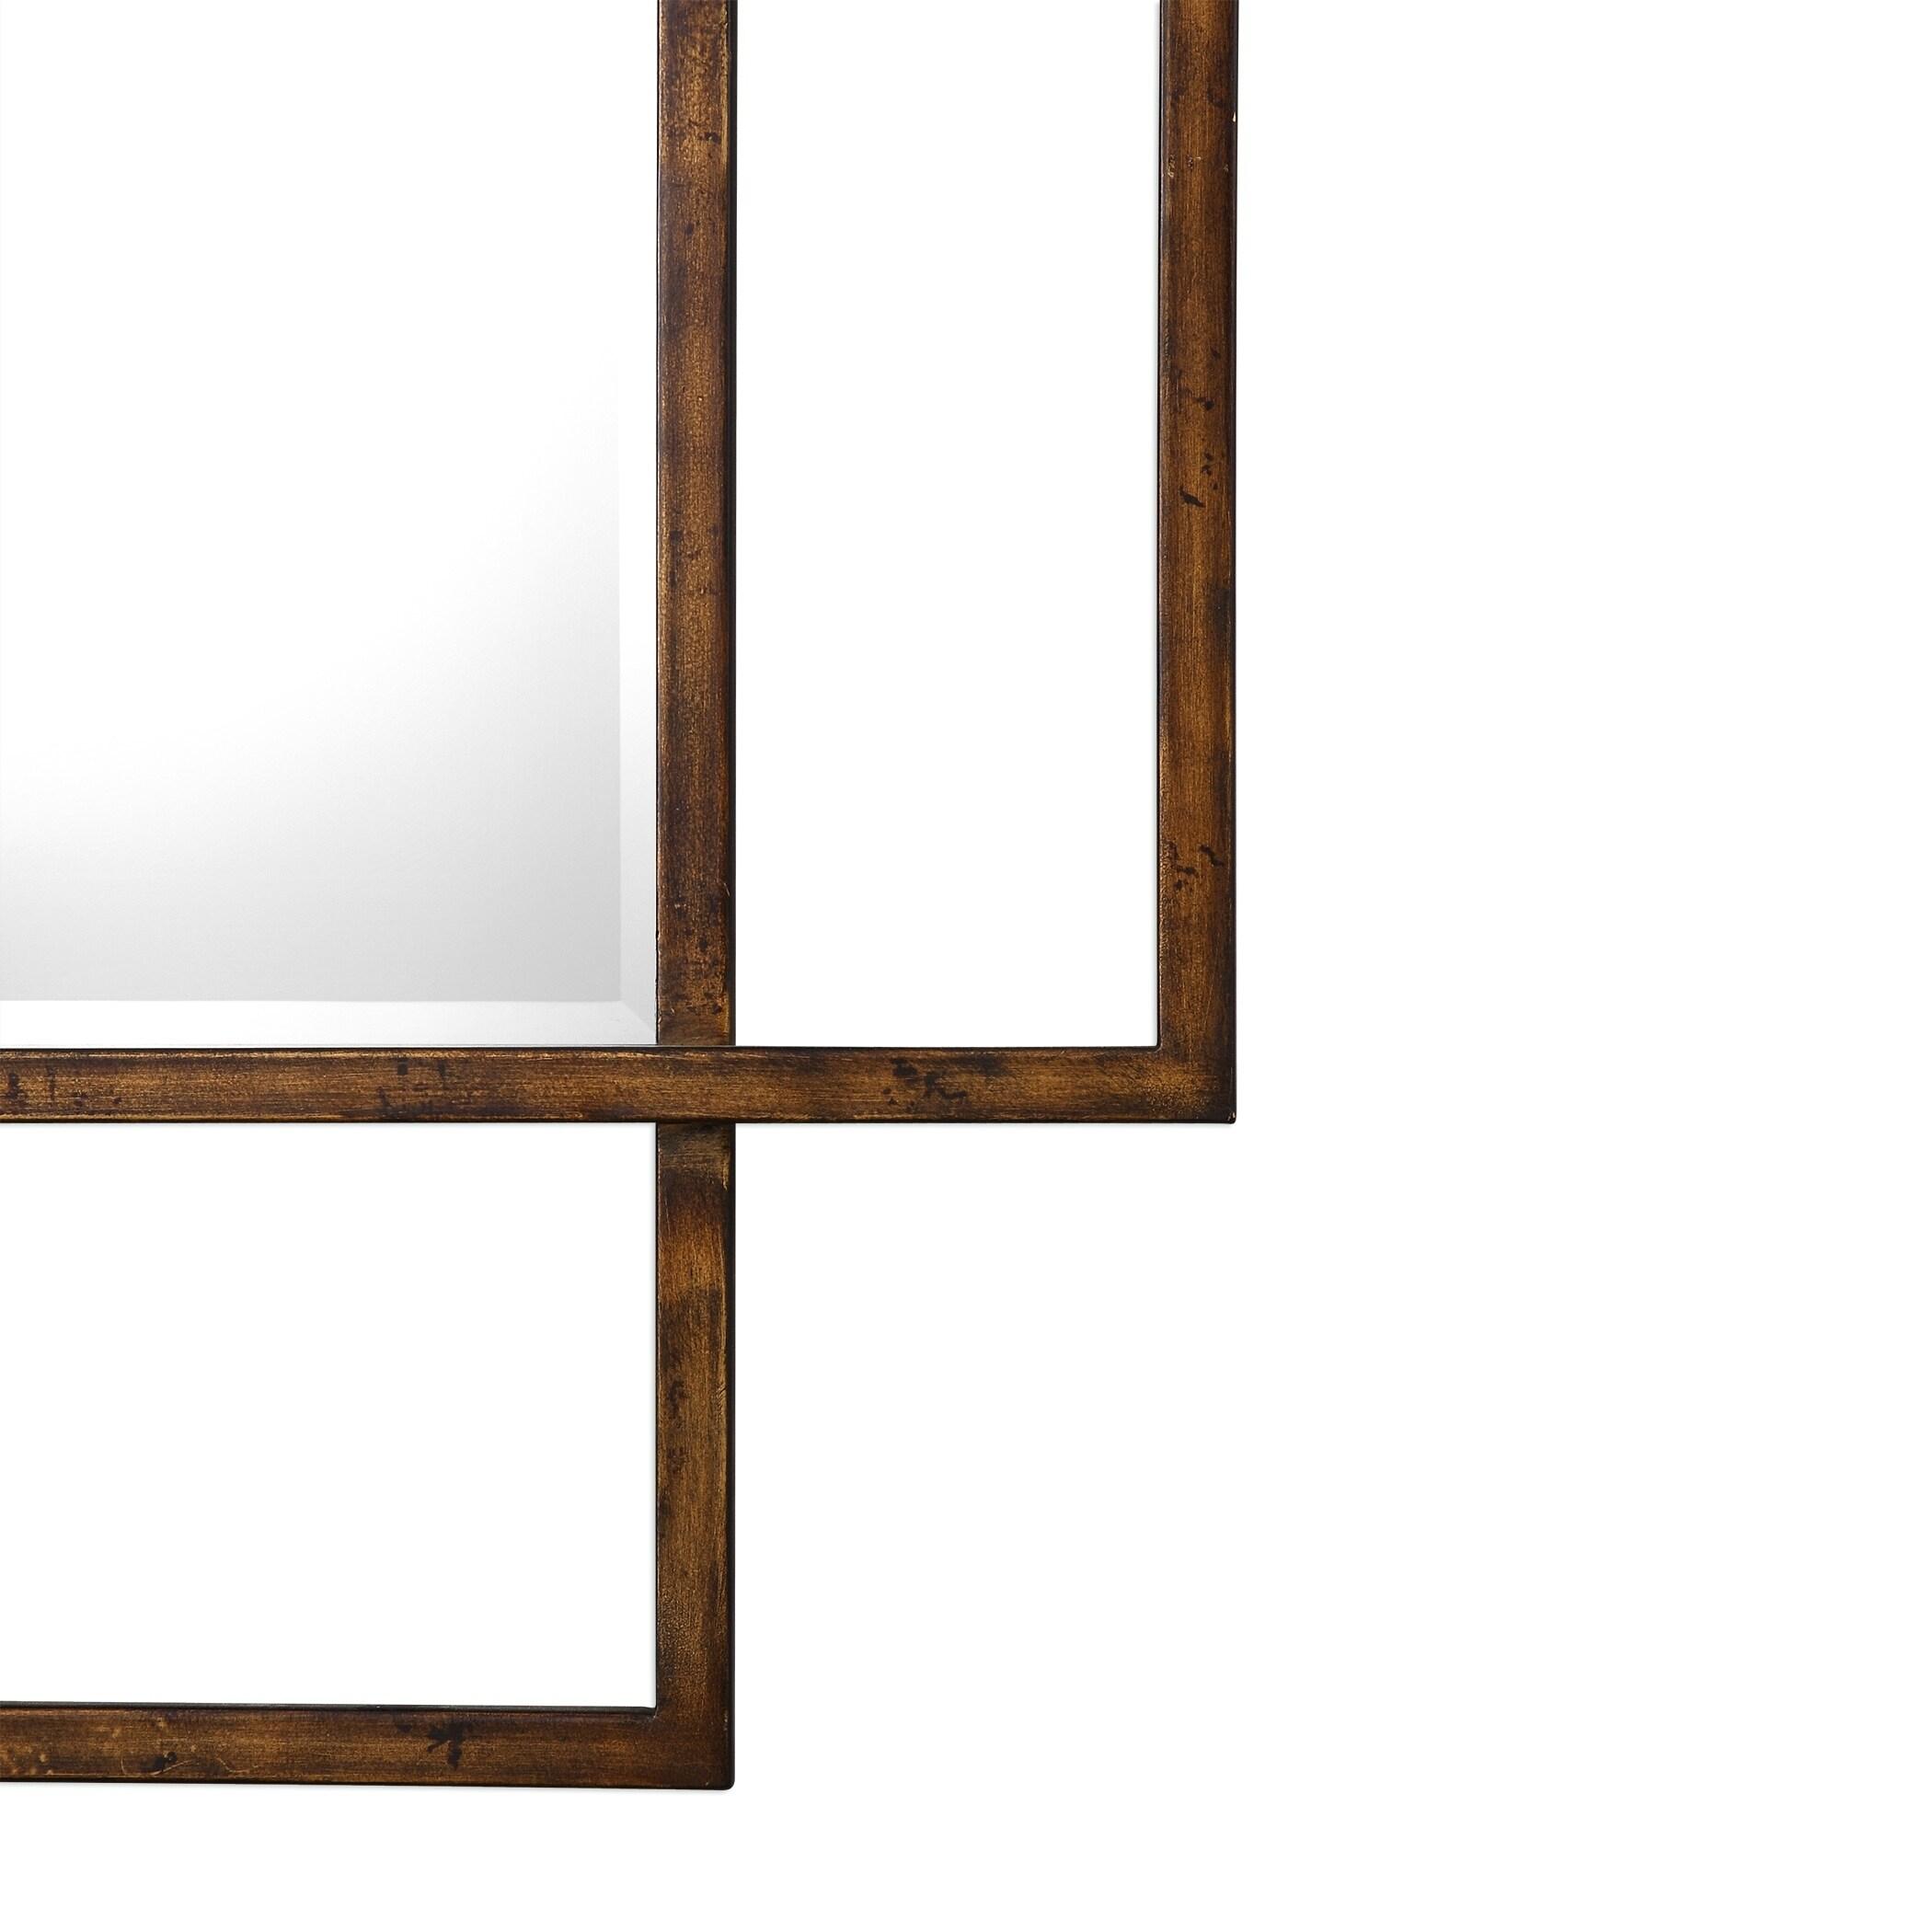 Uttermost Tribus Distressed Rust Bronze Mirror